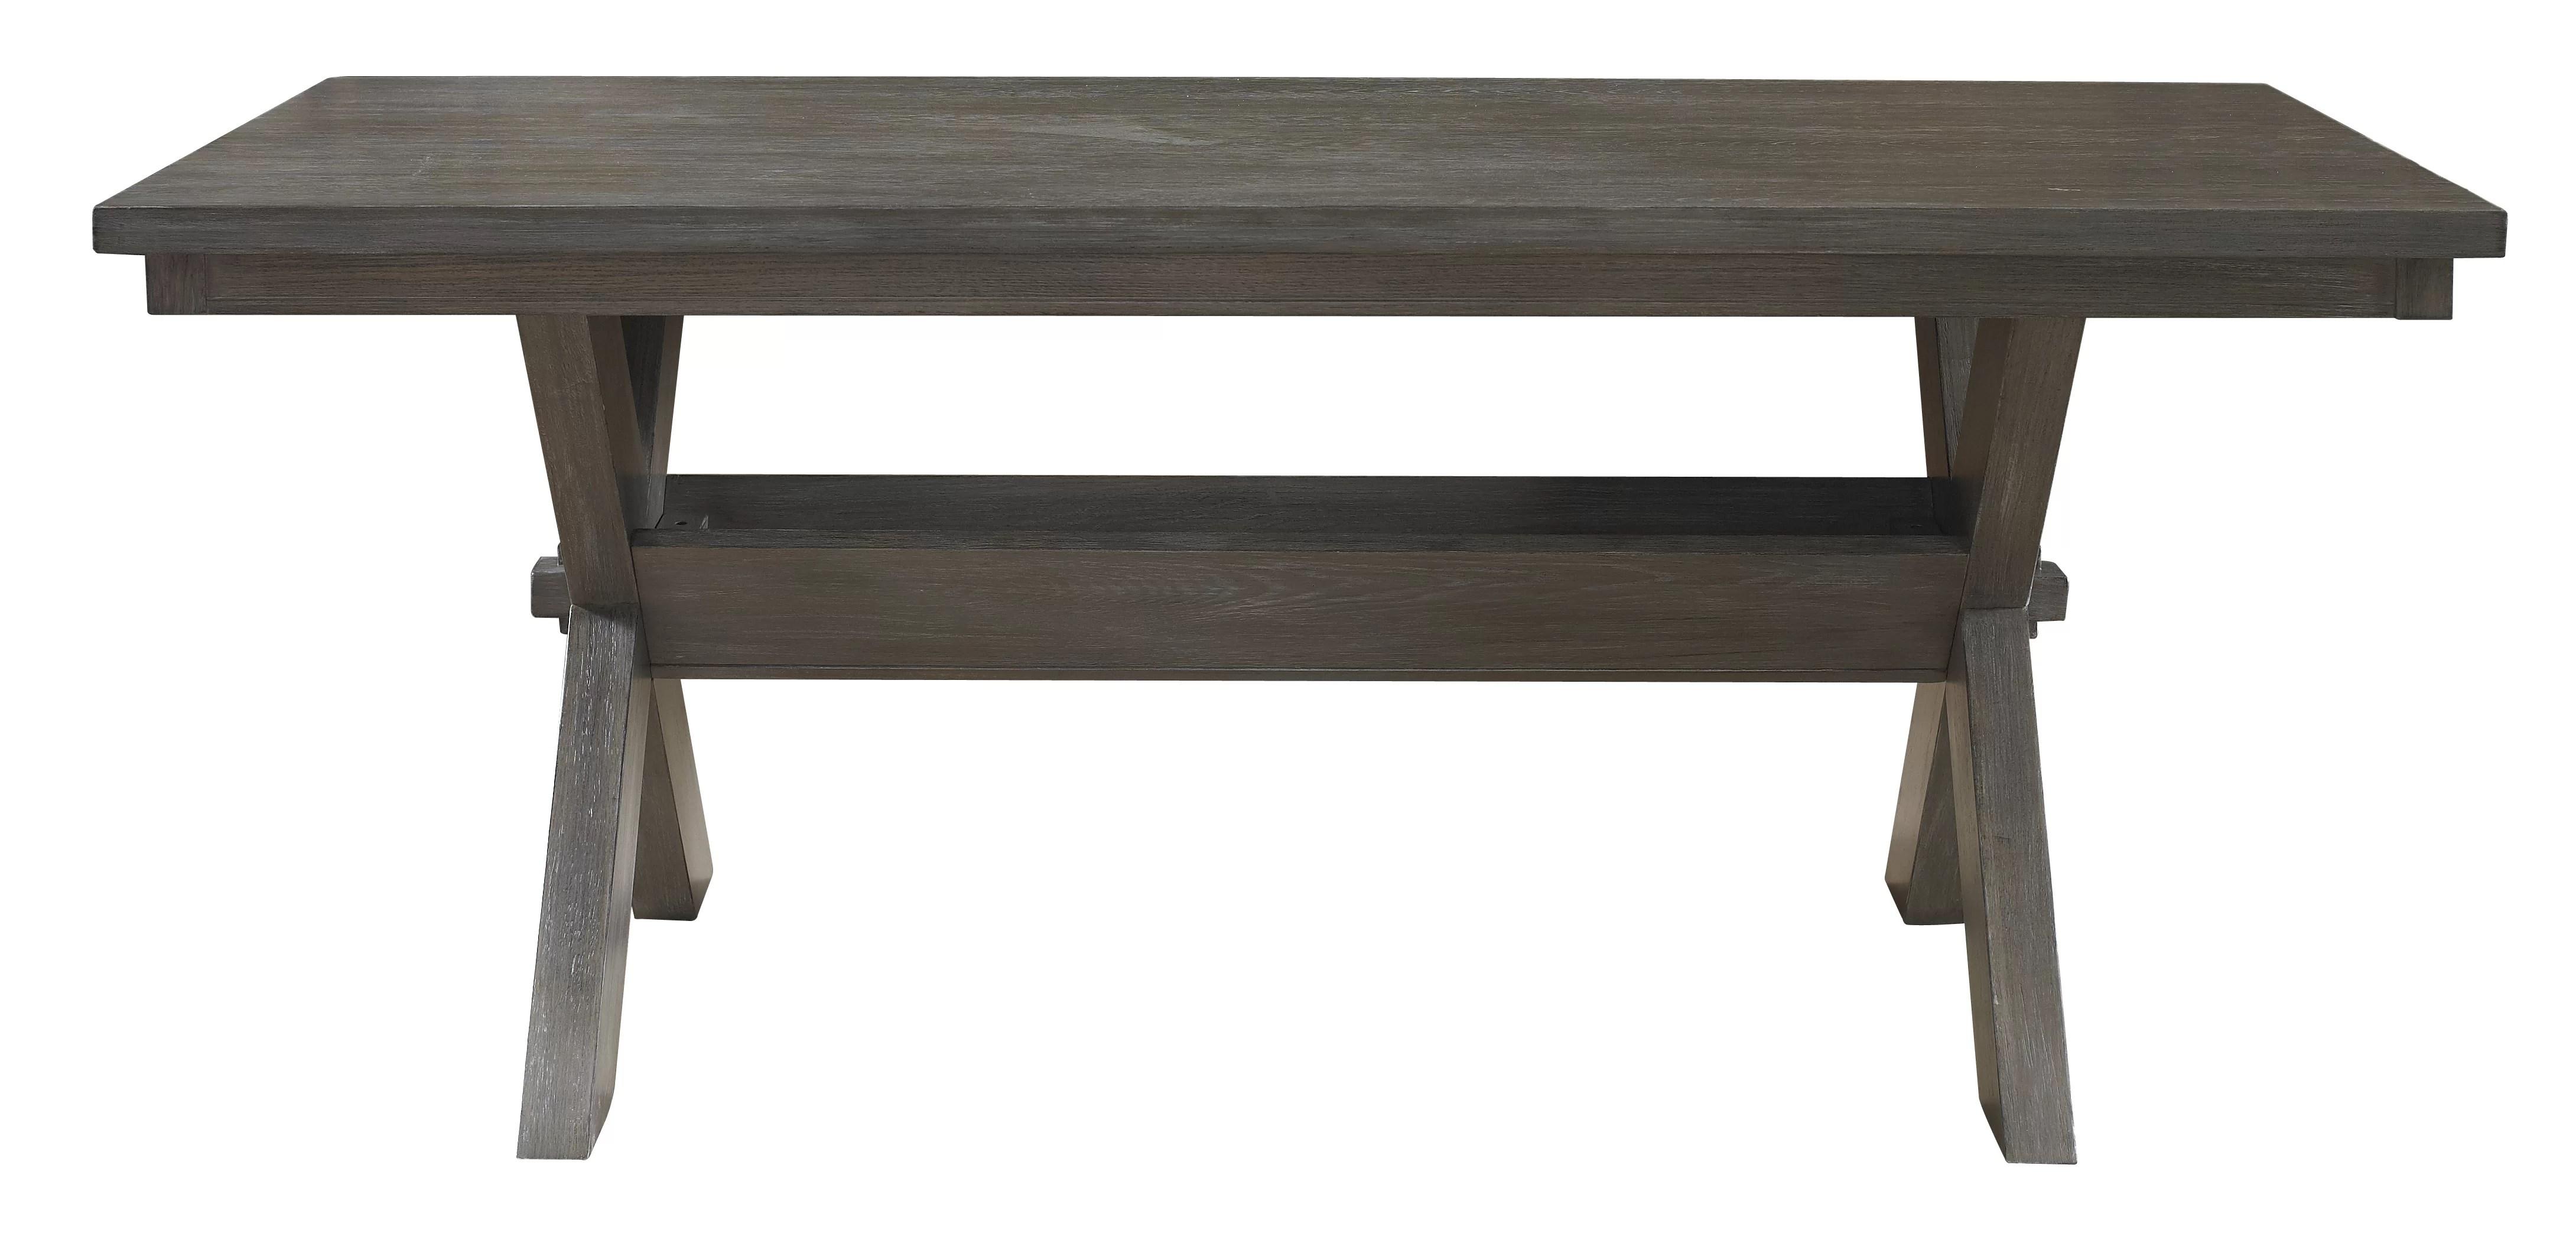 next quentin sofa bed review small single lark manor rectangular dining table reviews wayfair